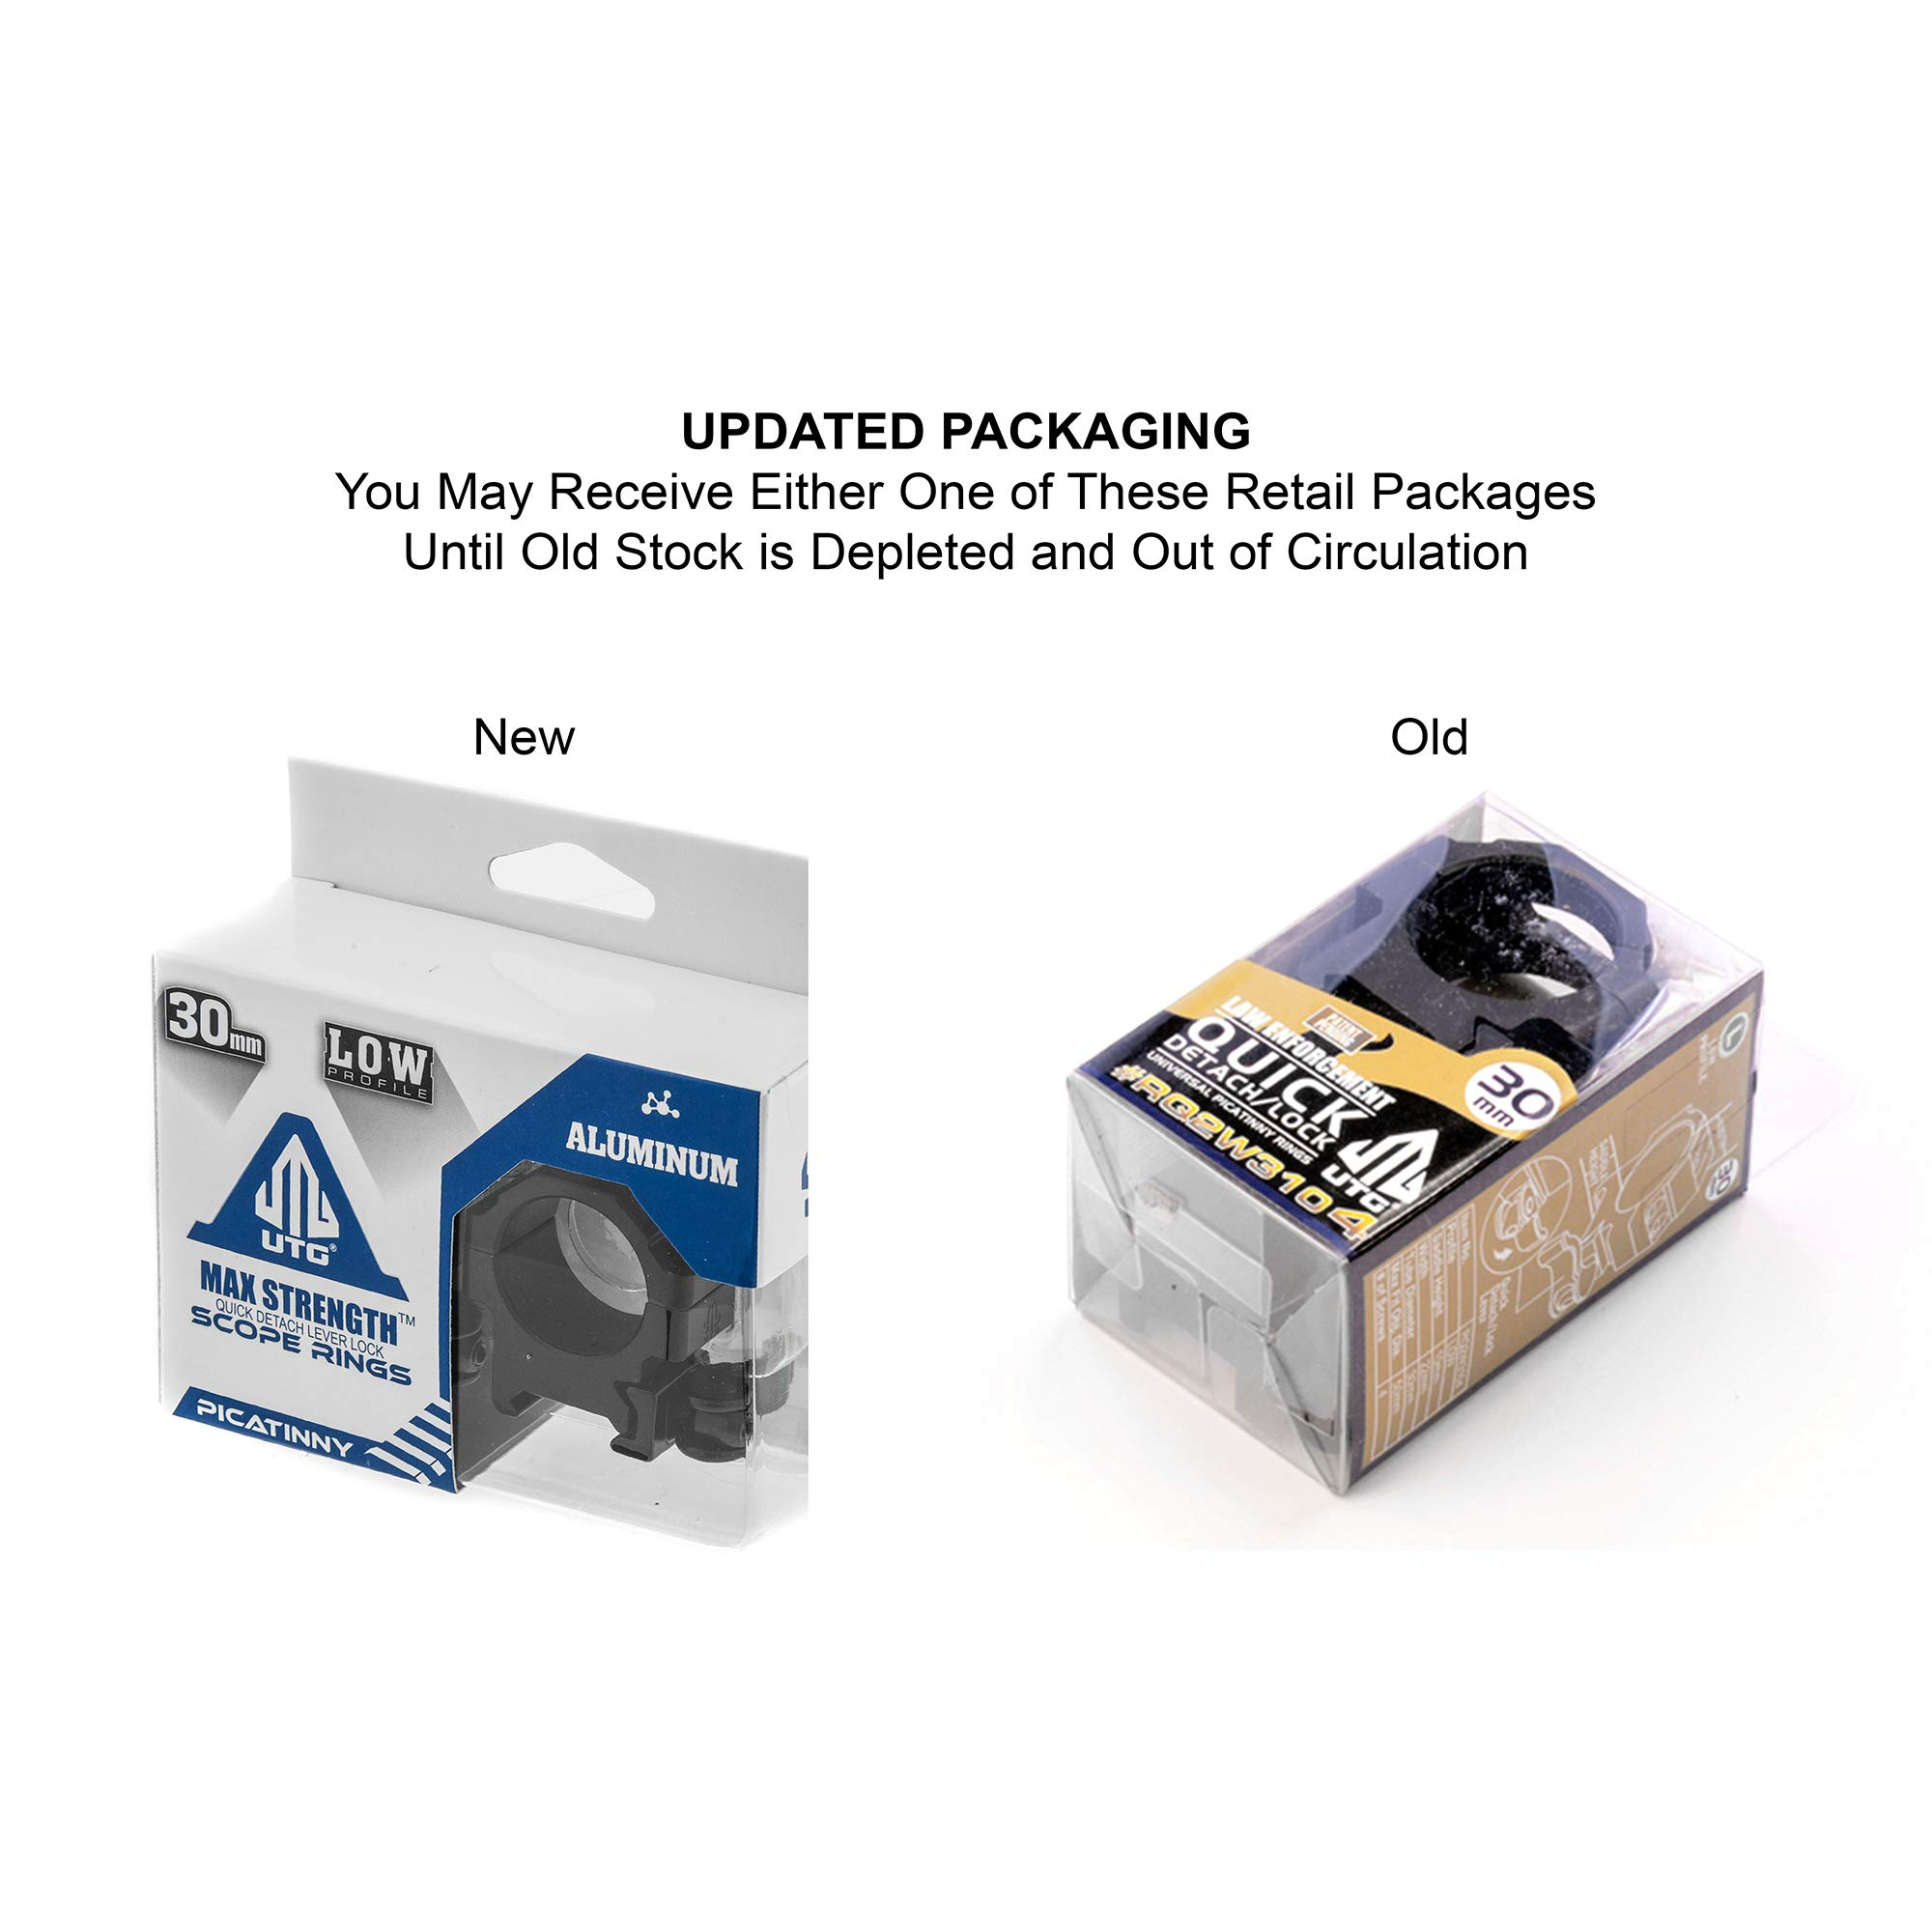 UTG 30mm/2PCs Low Pro LE Grade Picatinny QD Rings: 22mm Wide by UTG